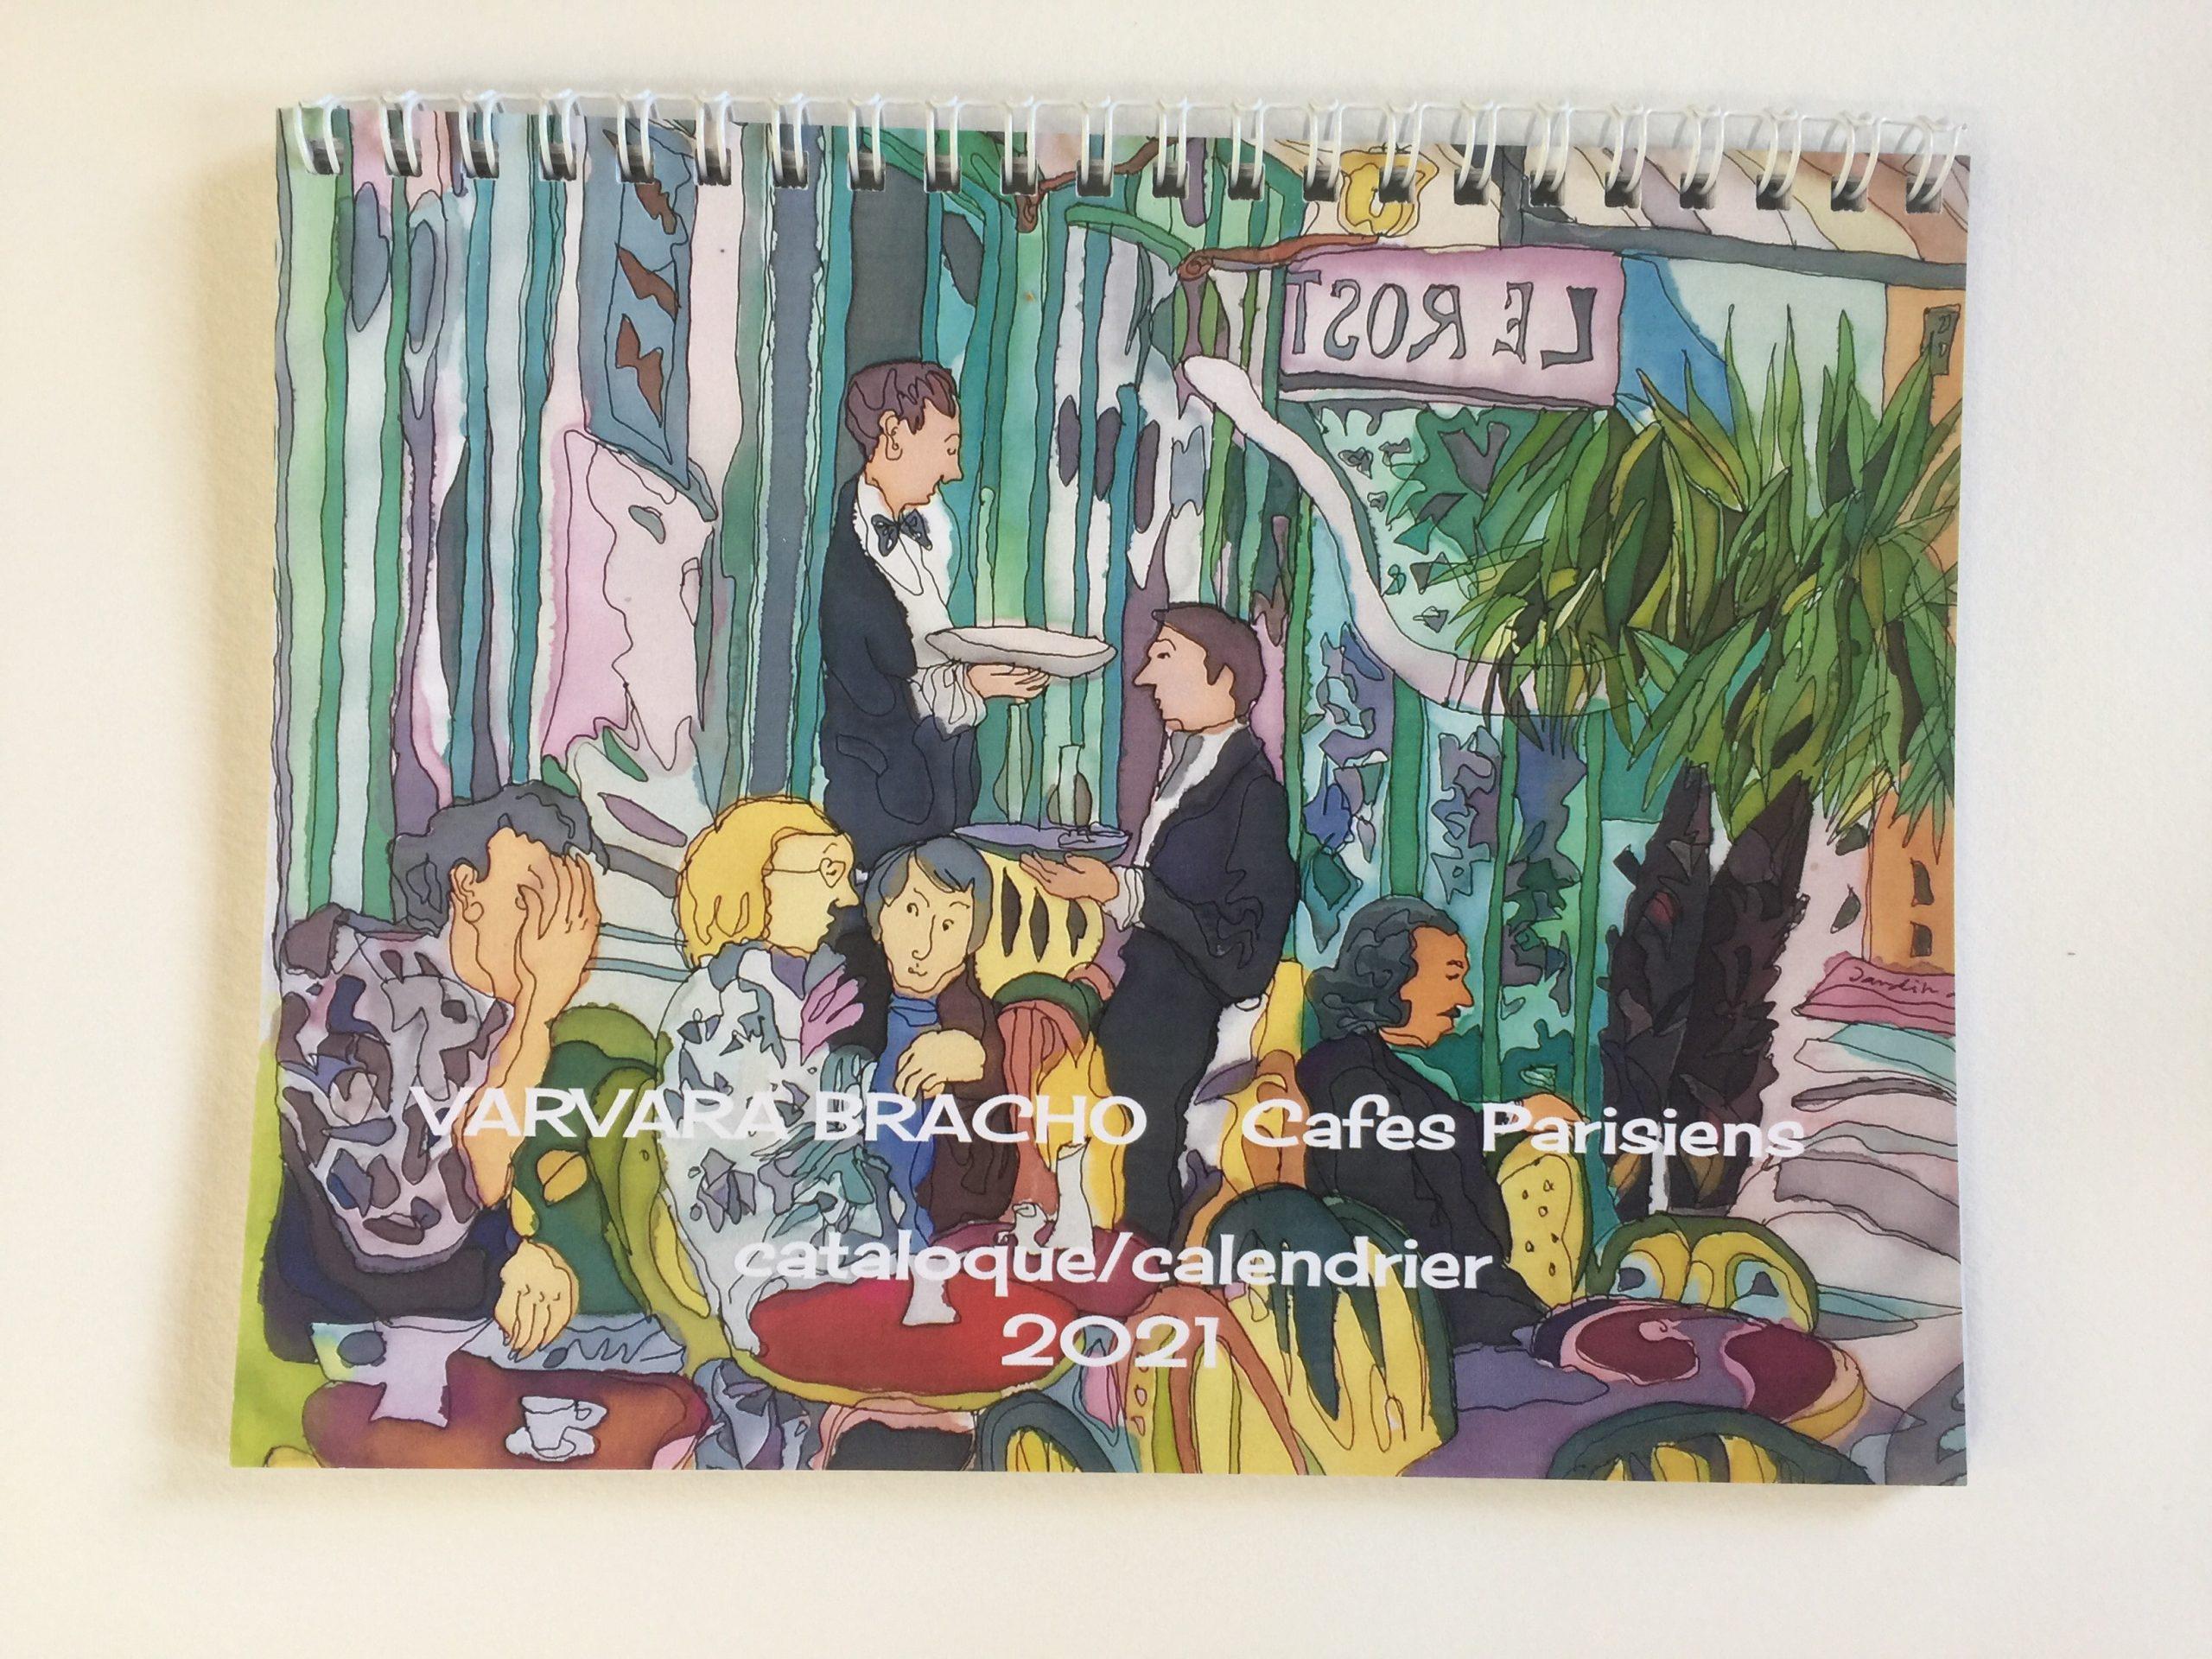 Art Gallery Varvara Bracho » Calendar / catalog 2021 Parisian Cafes